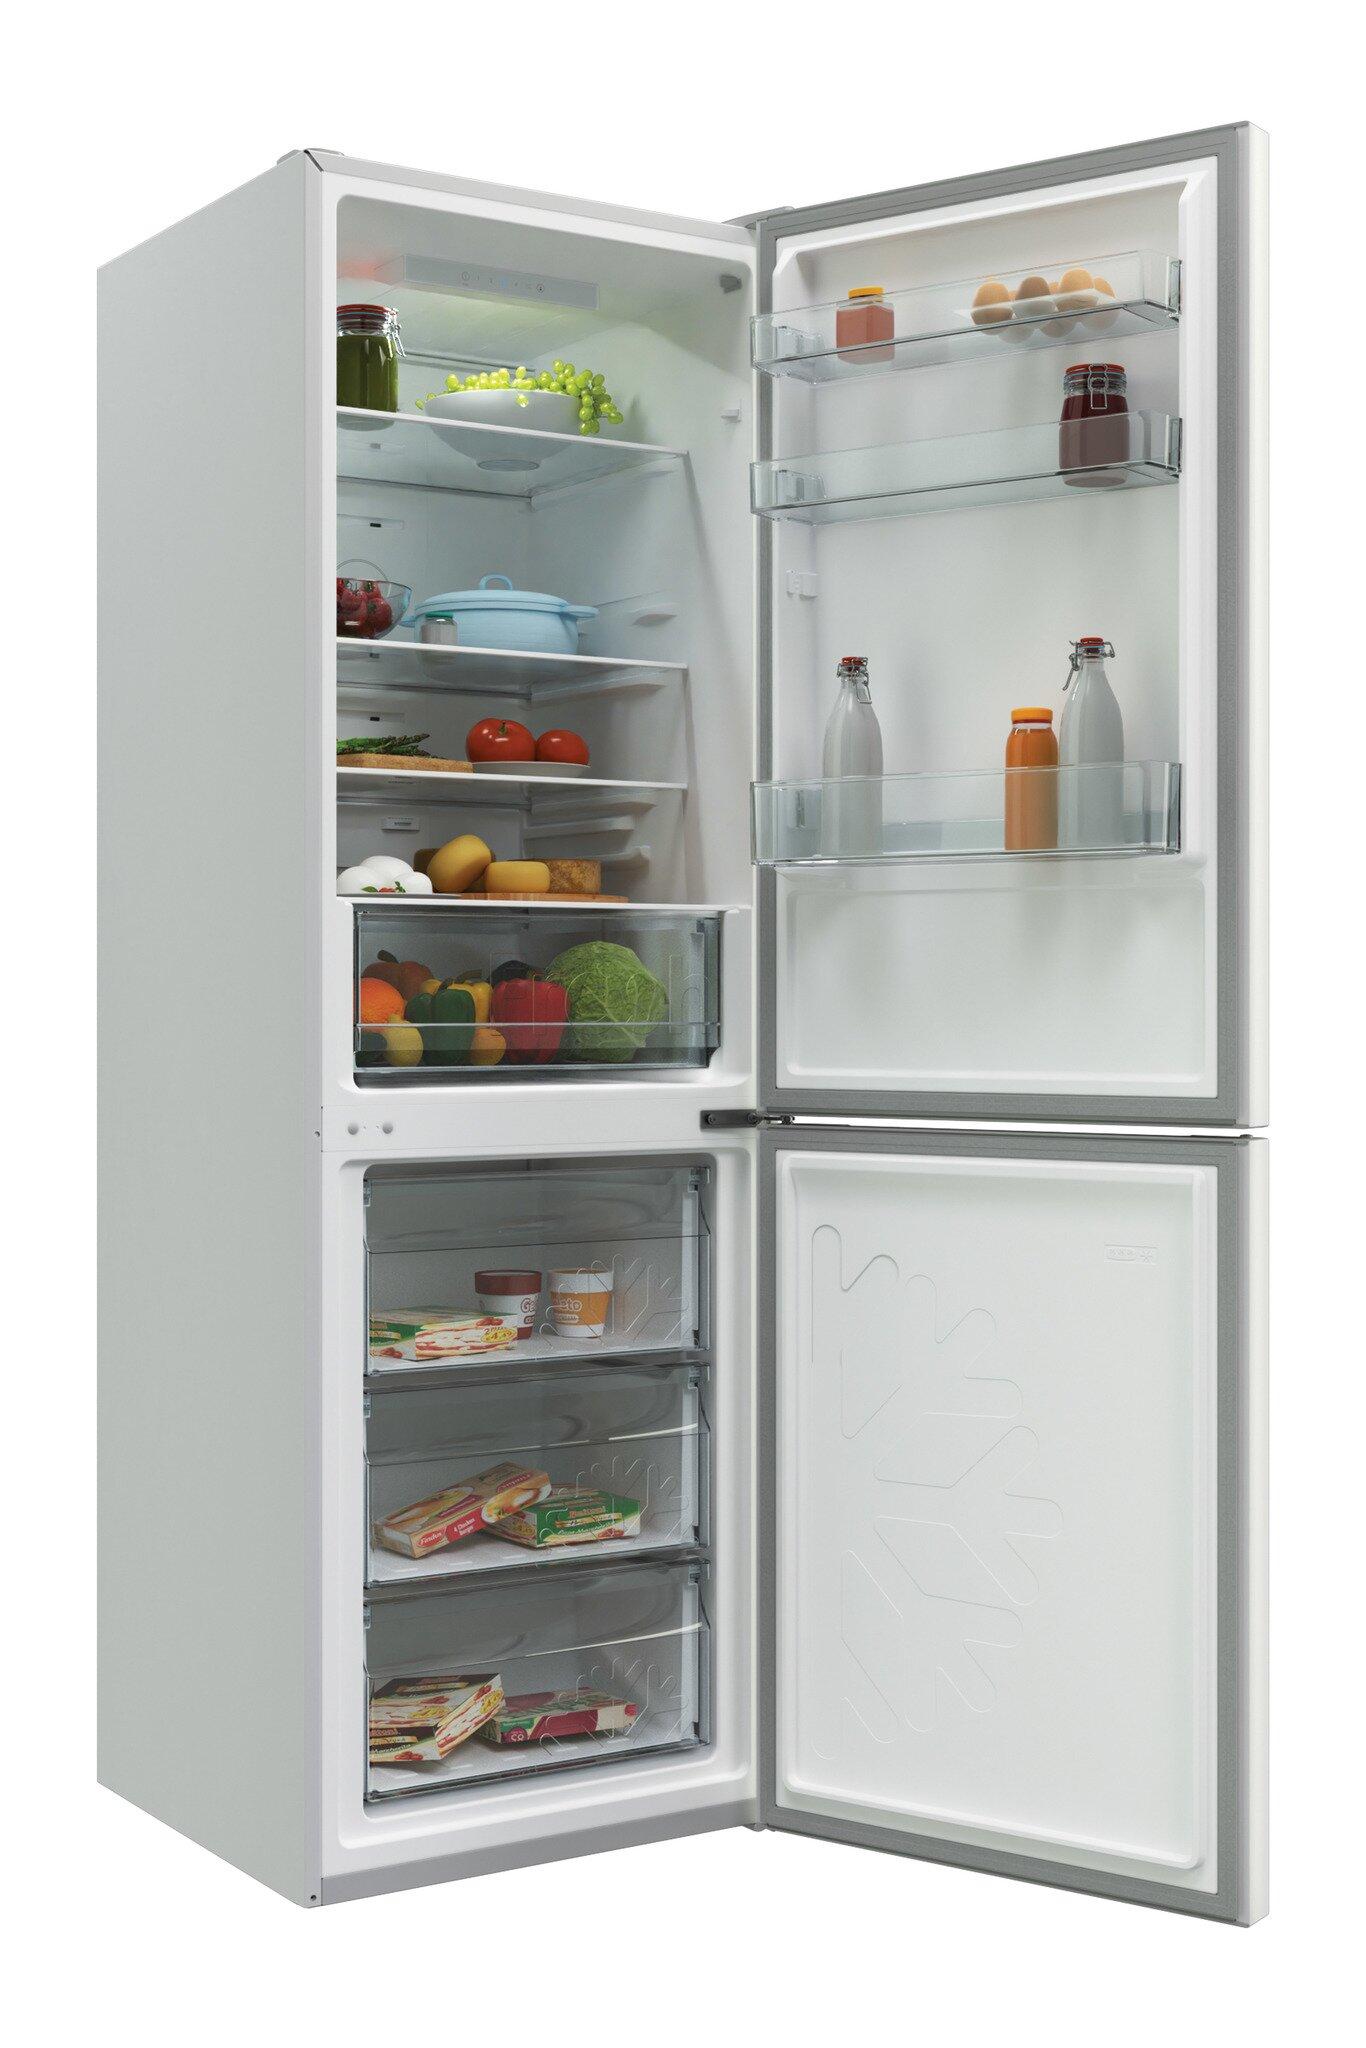 1 34004287 15 05 L CCRN 6180 W - Что полезно знать до установки холодильника?